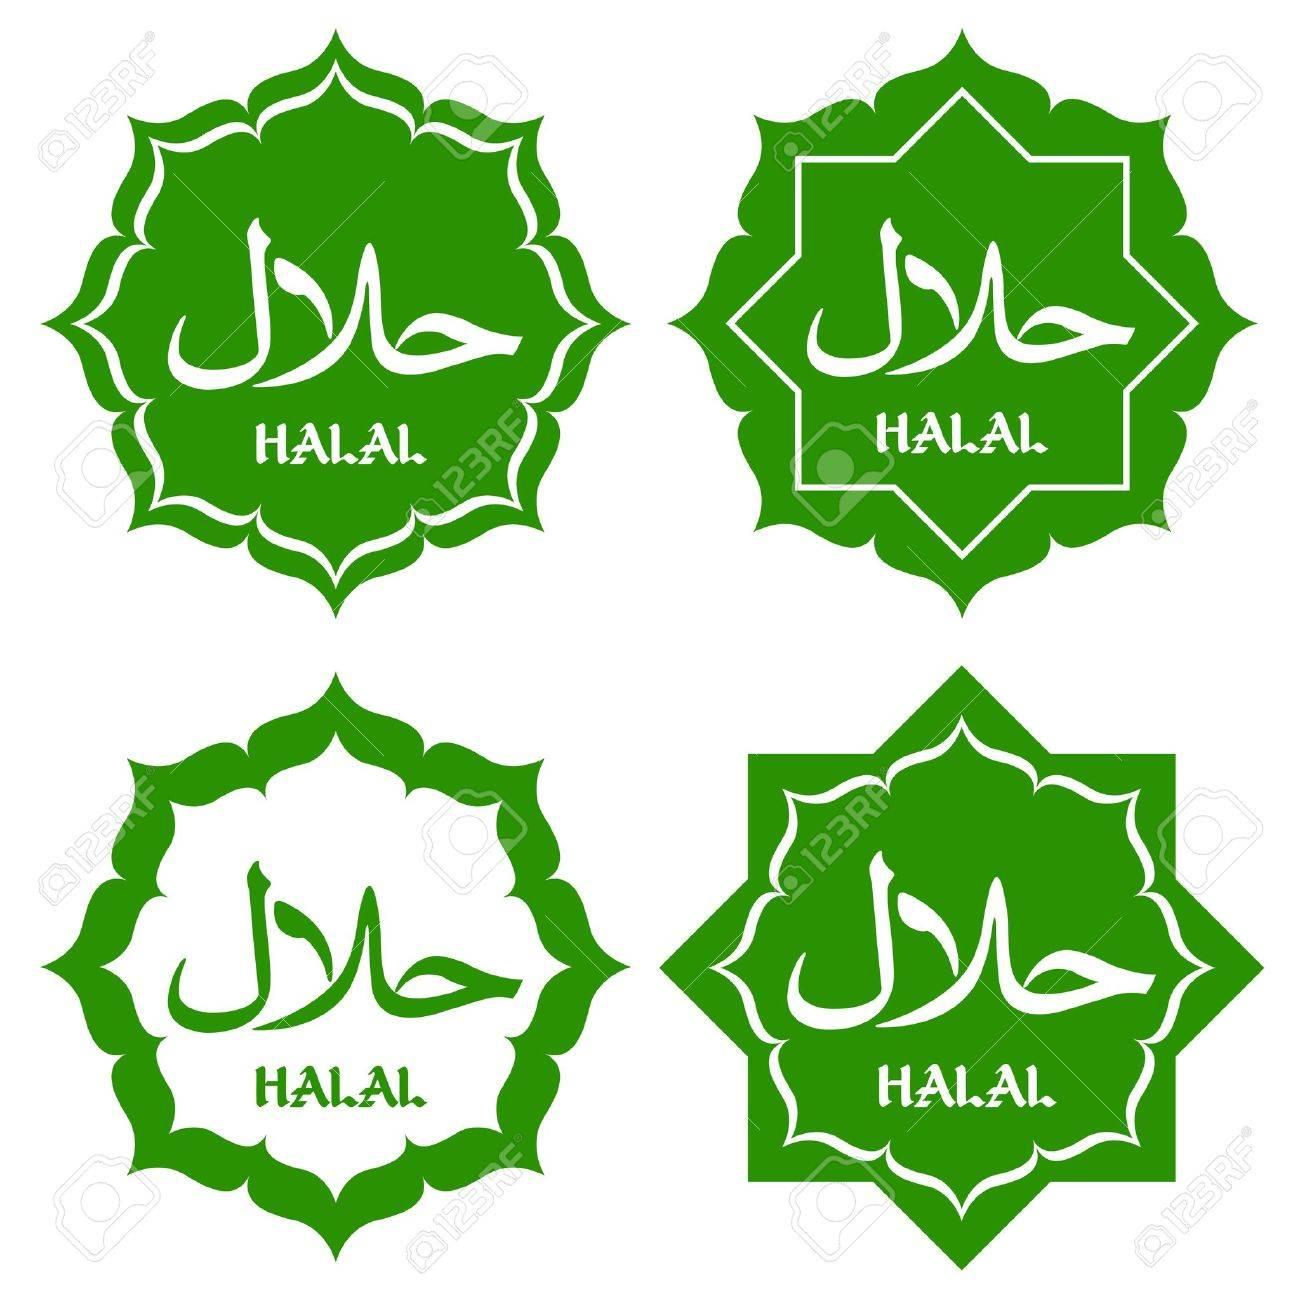 Halal Logo Vector Halal Food Logo Vector Halal